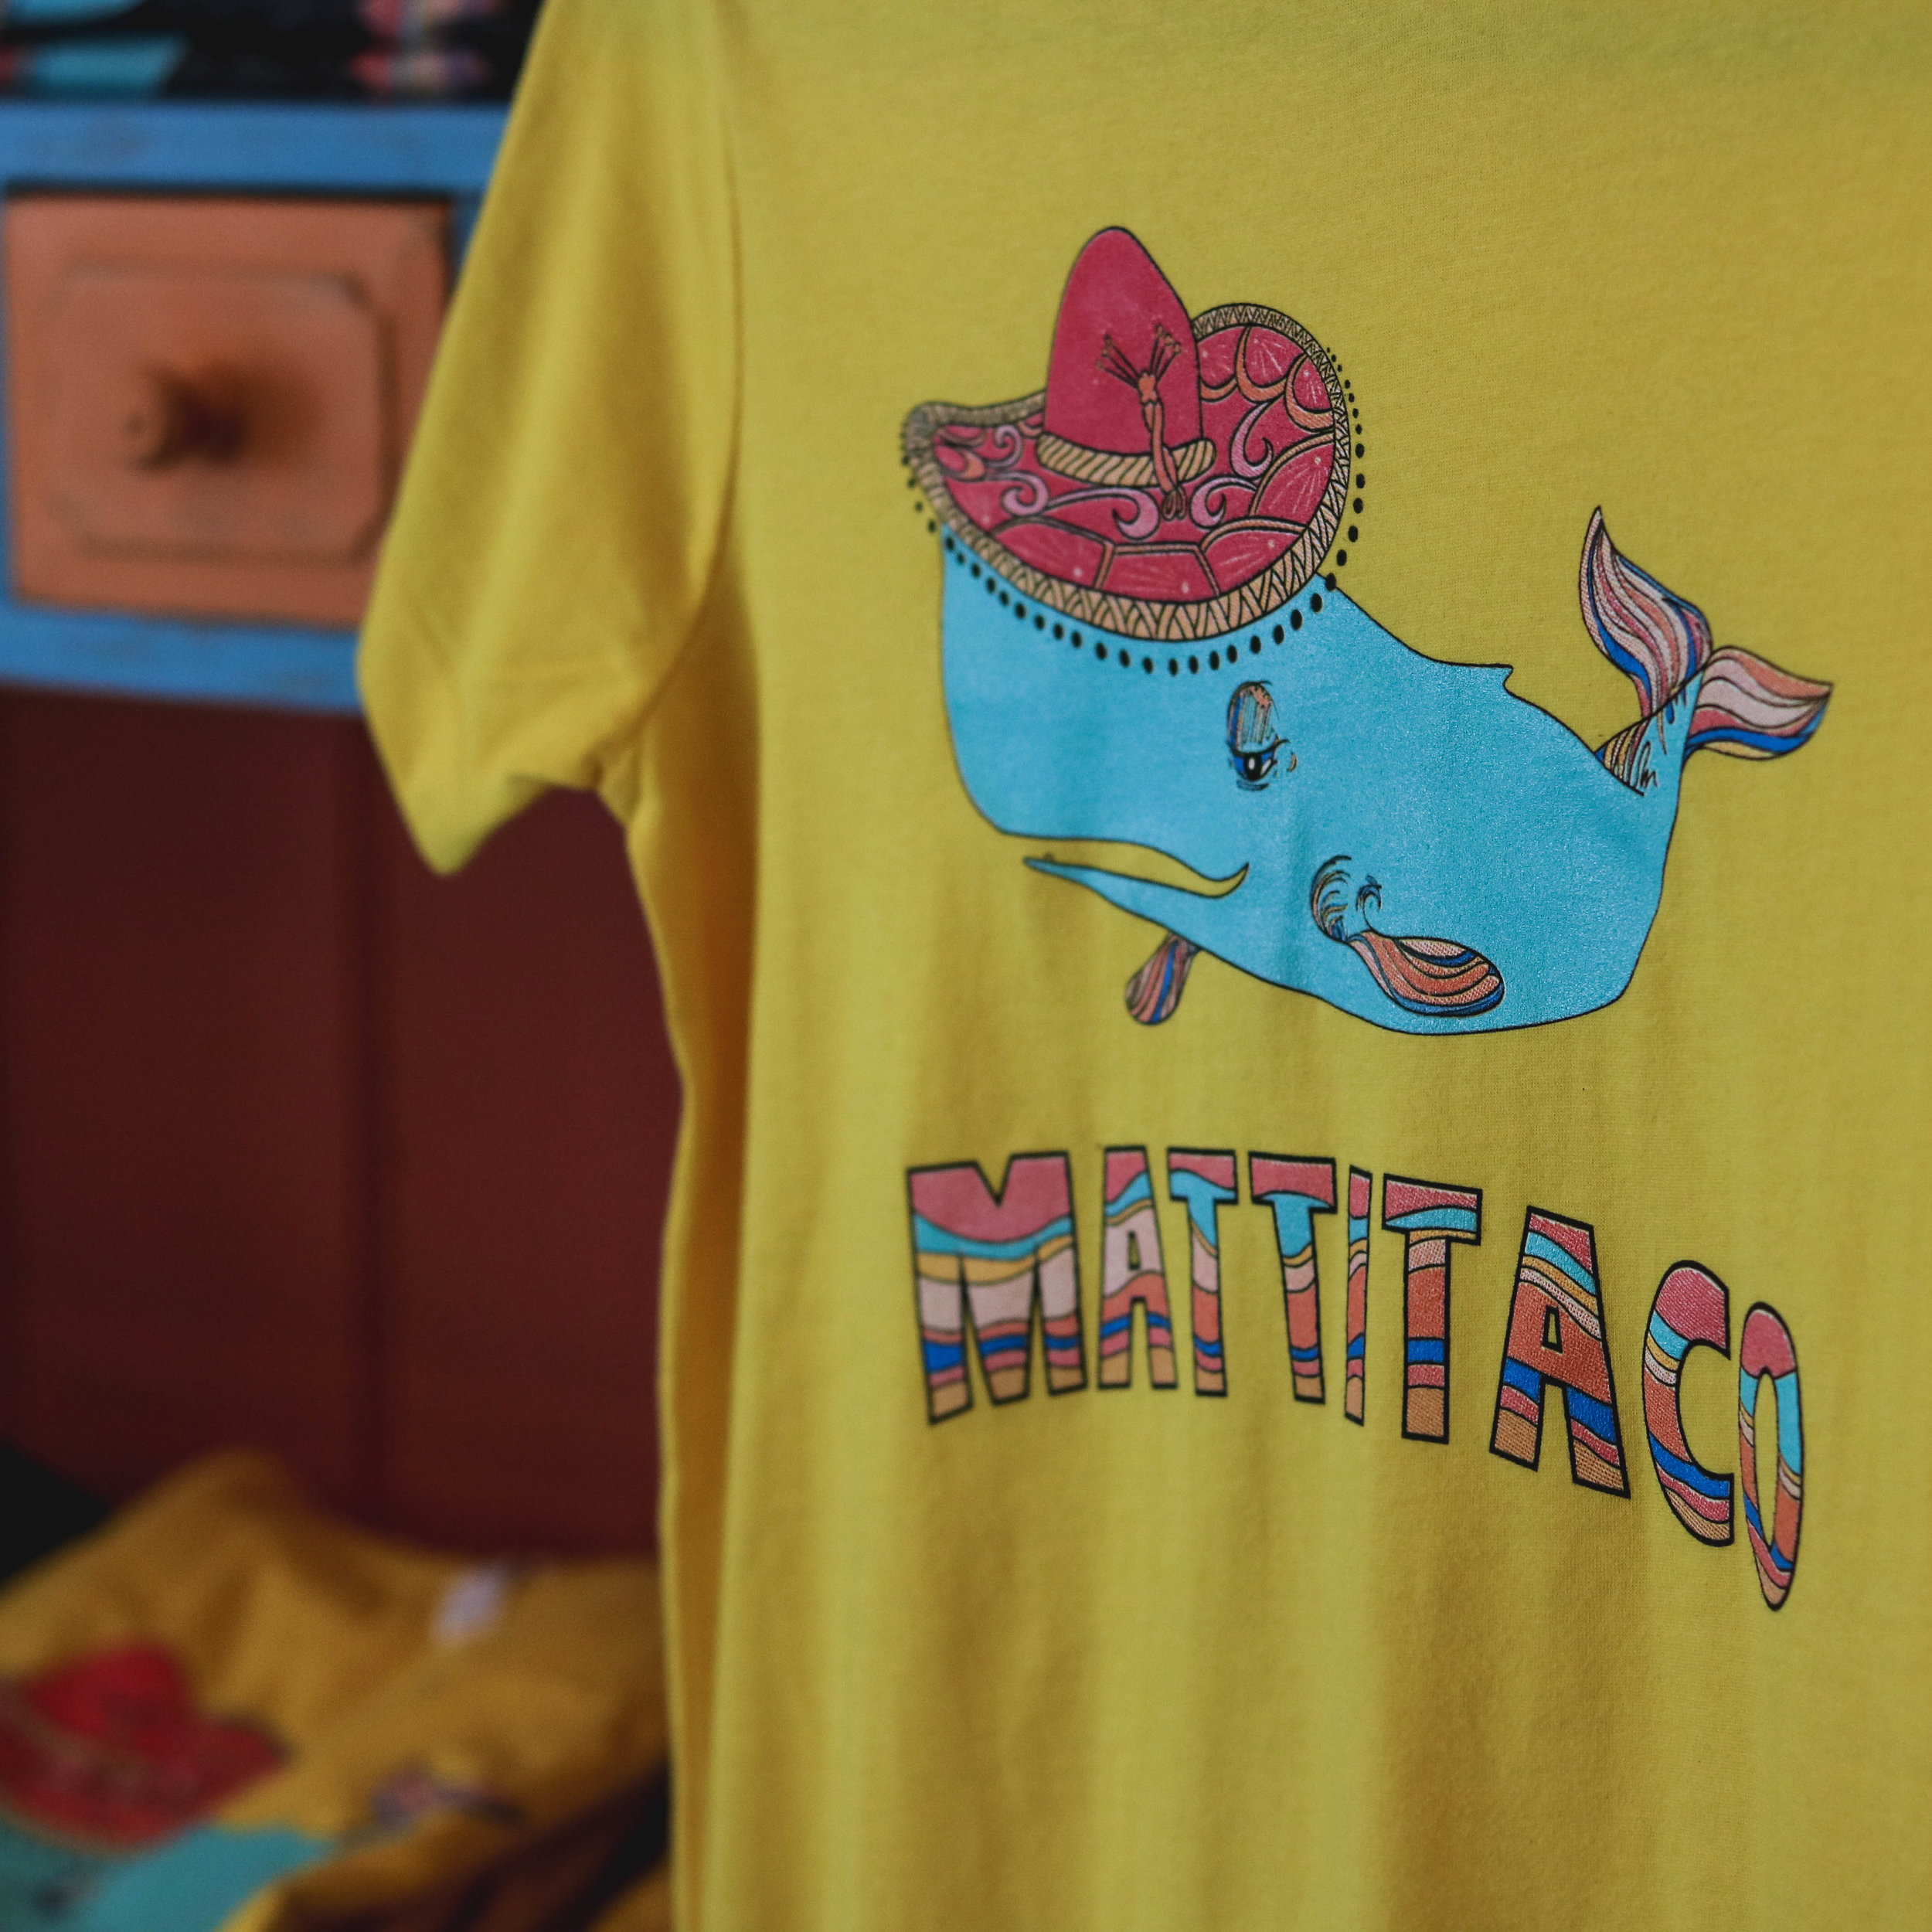 Mattitaco-082118-1.jpg